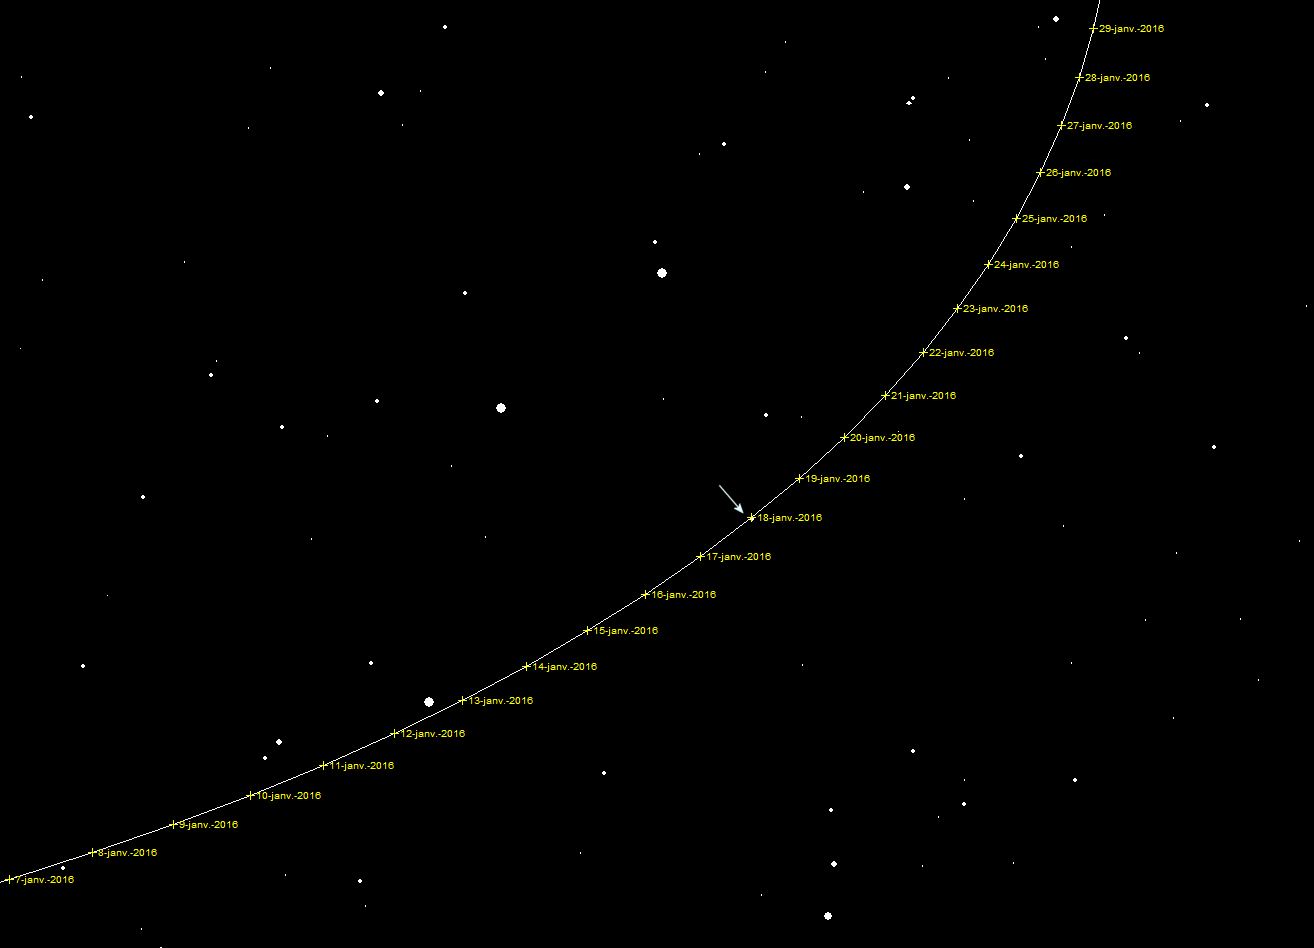 http://ekladata.com/aqJg77vV6lhPklz3ECcUjaNpXIg/daphne-occultation-traj-asteroide-new.png